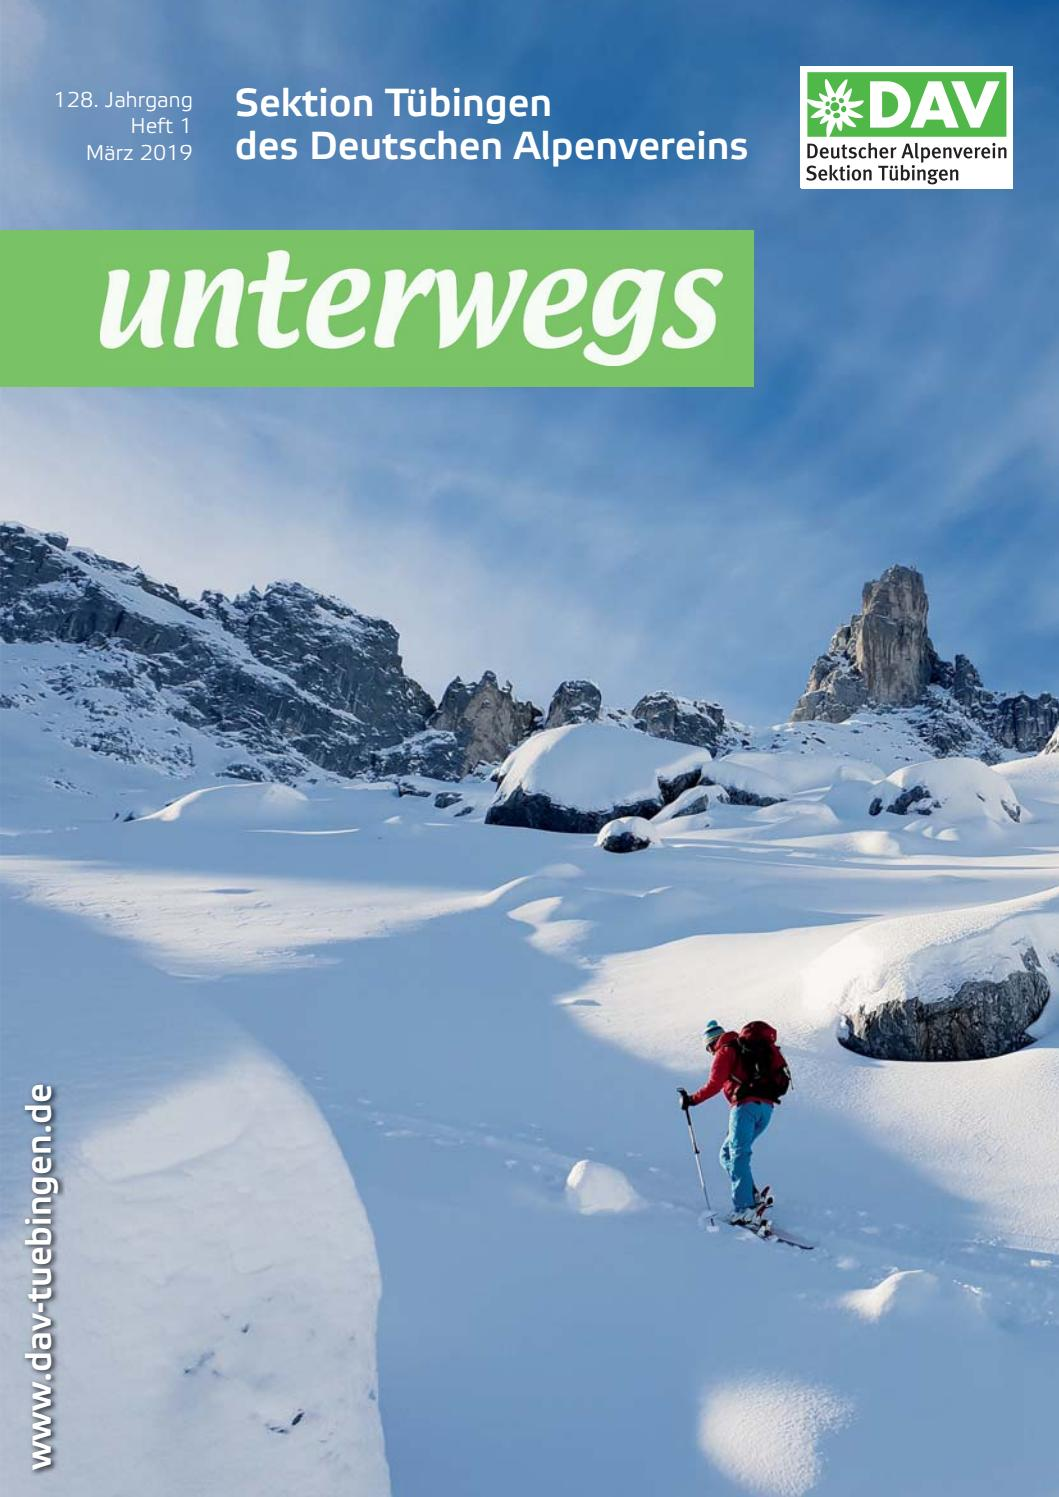 Echt S. d. KAMEL DORF 2017 Neue Winter Jacke Männer Dicke